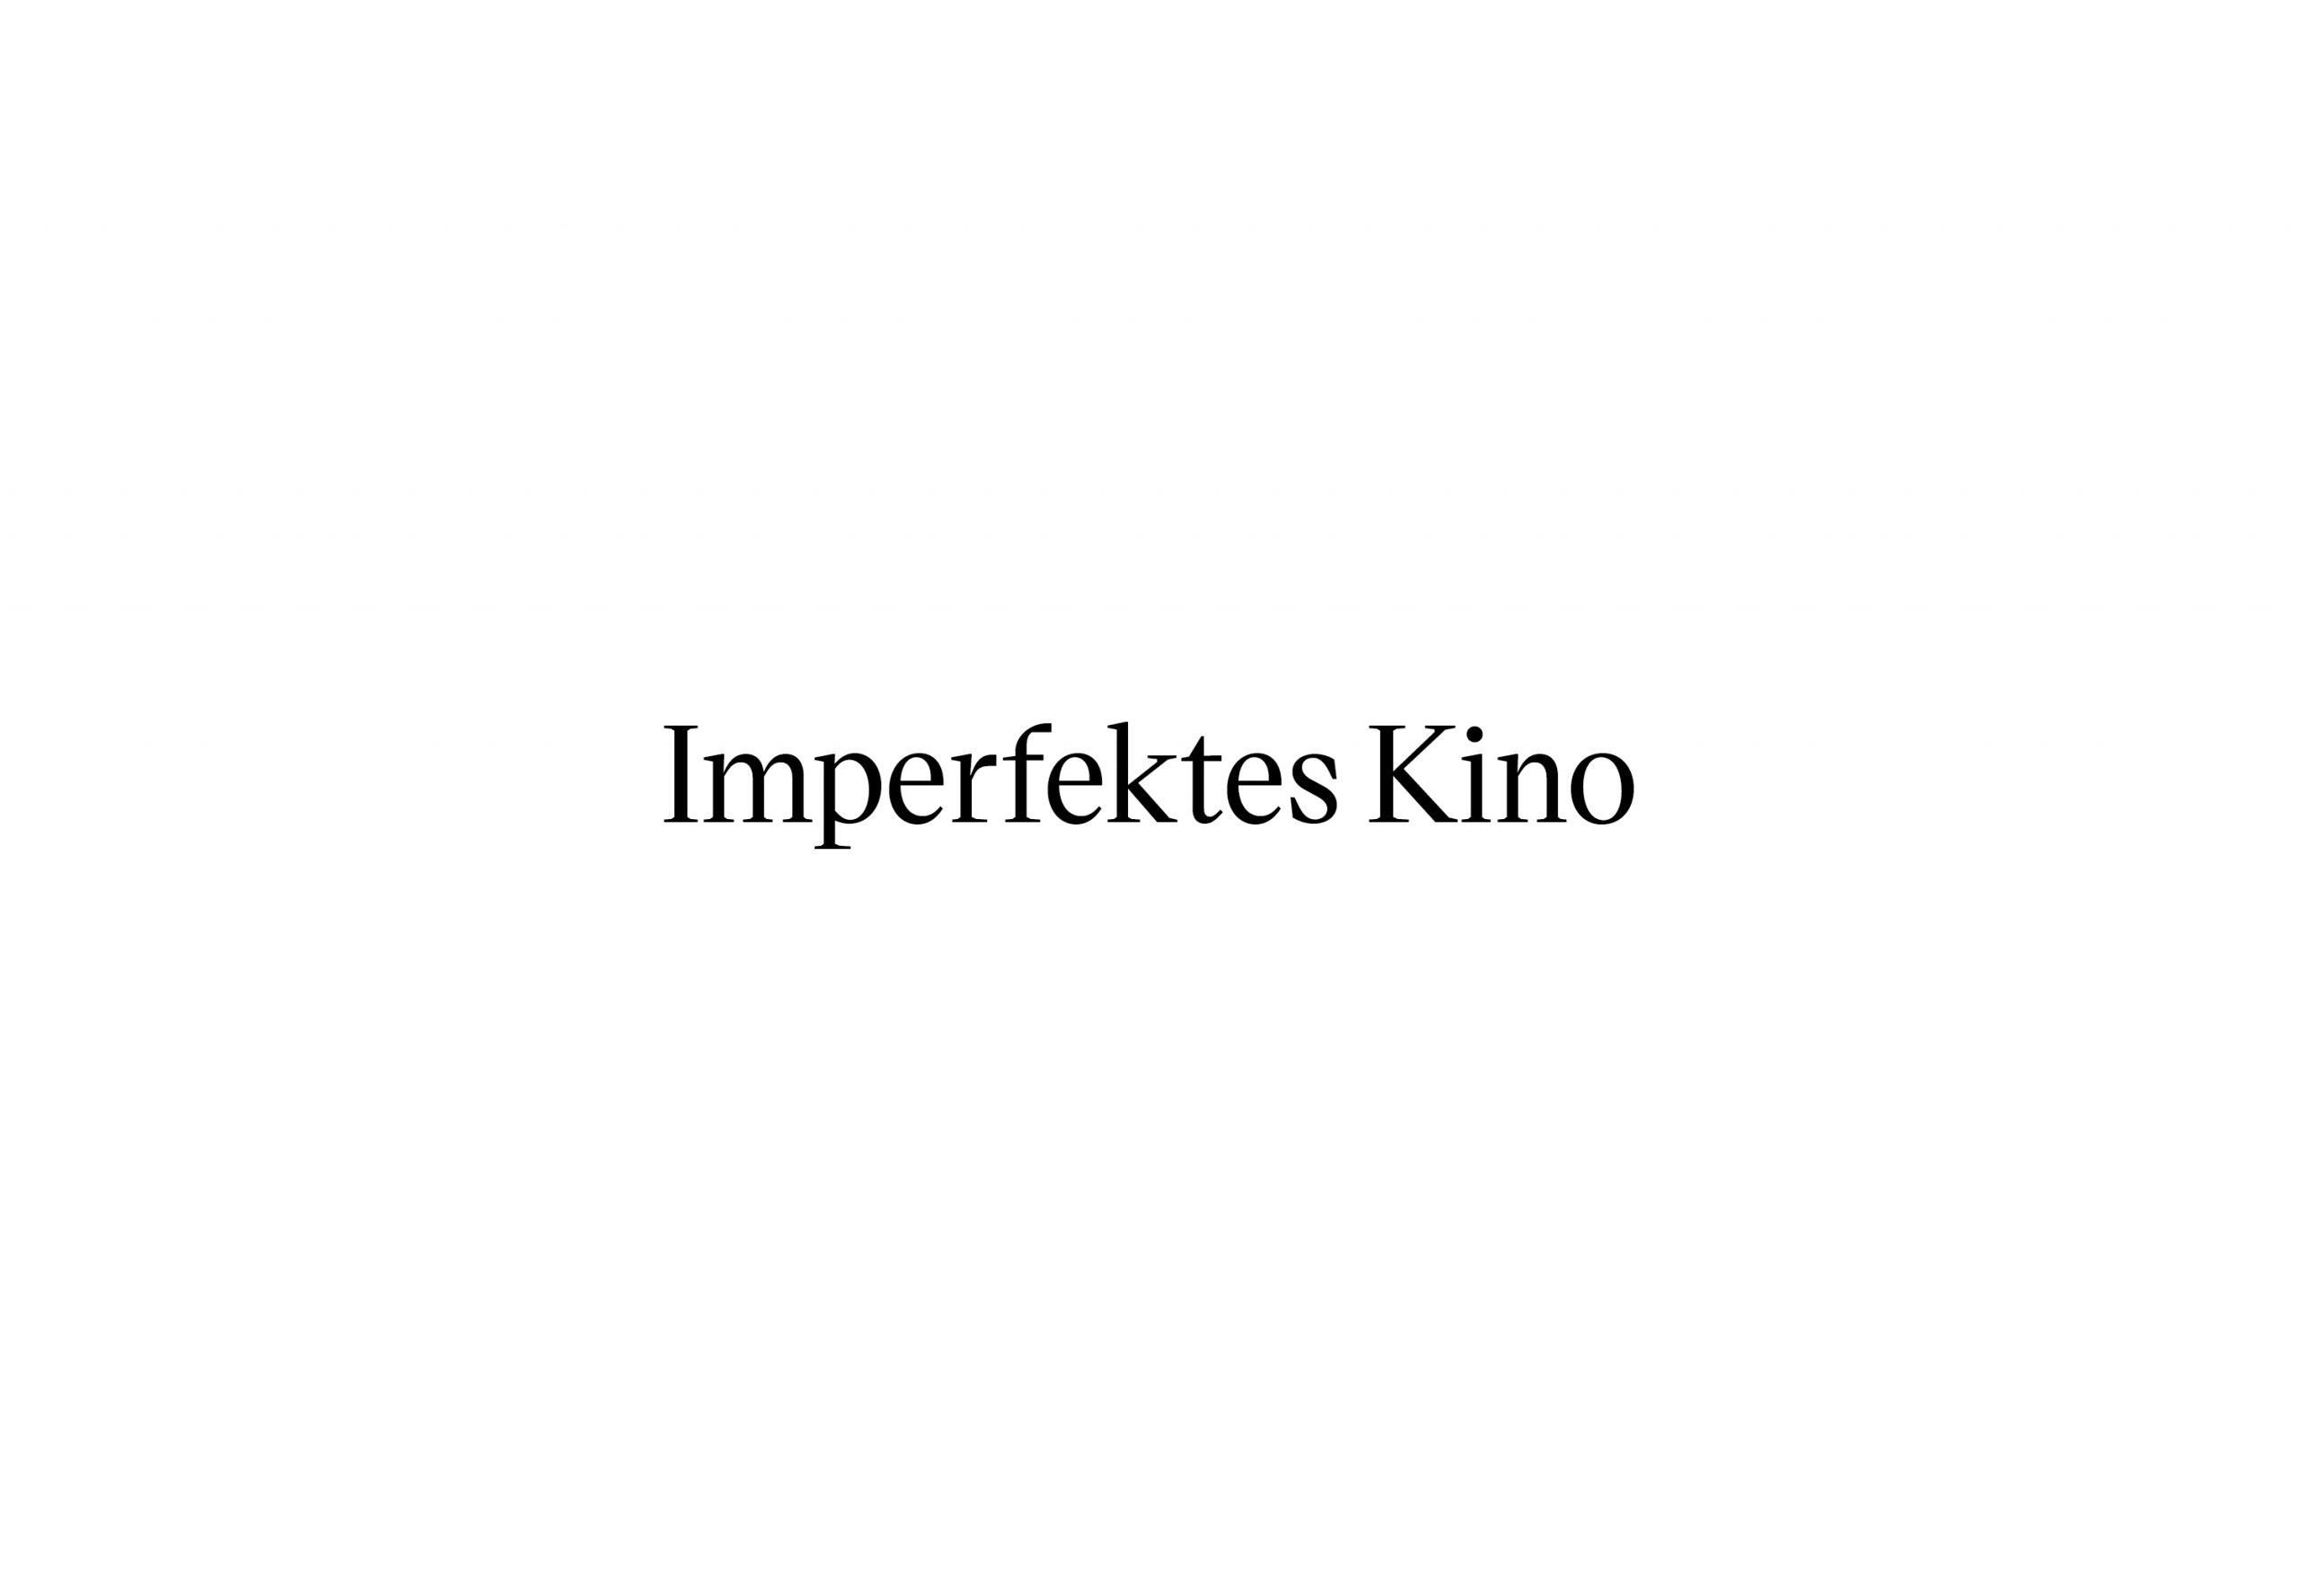 Imperfekts Kino